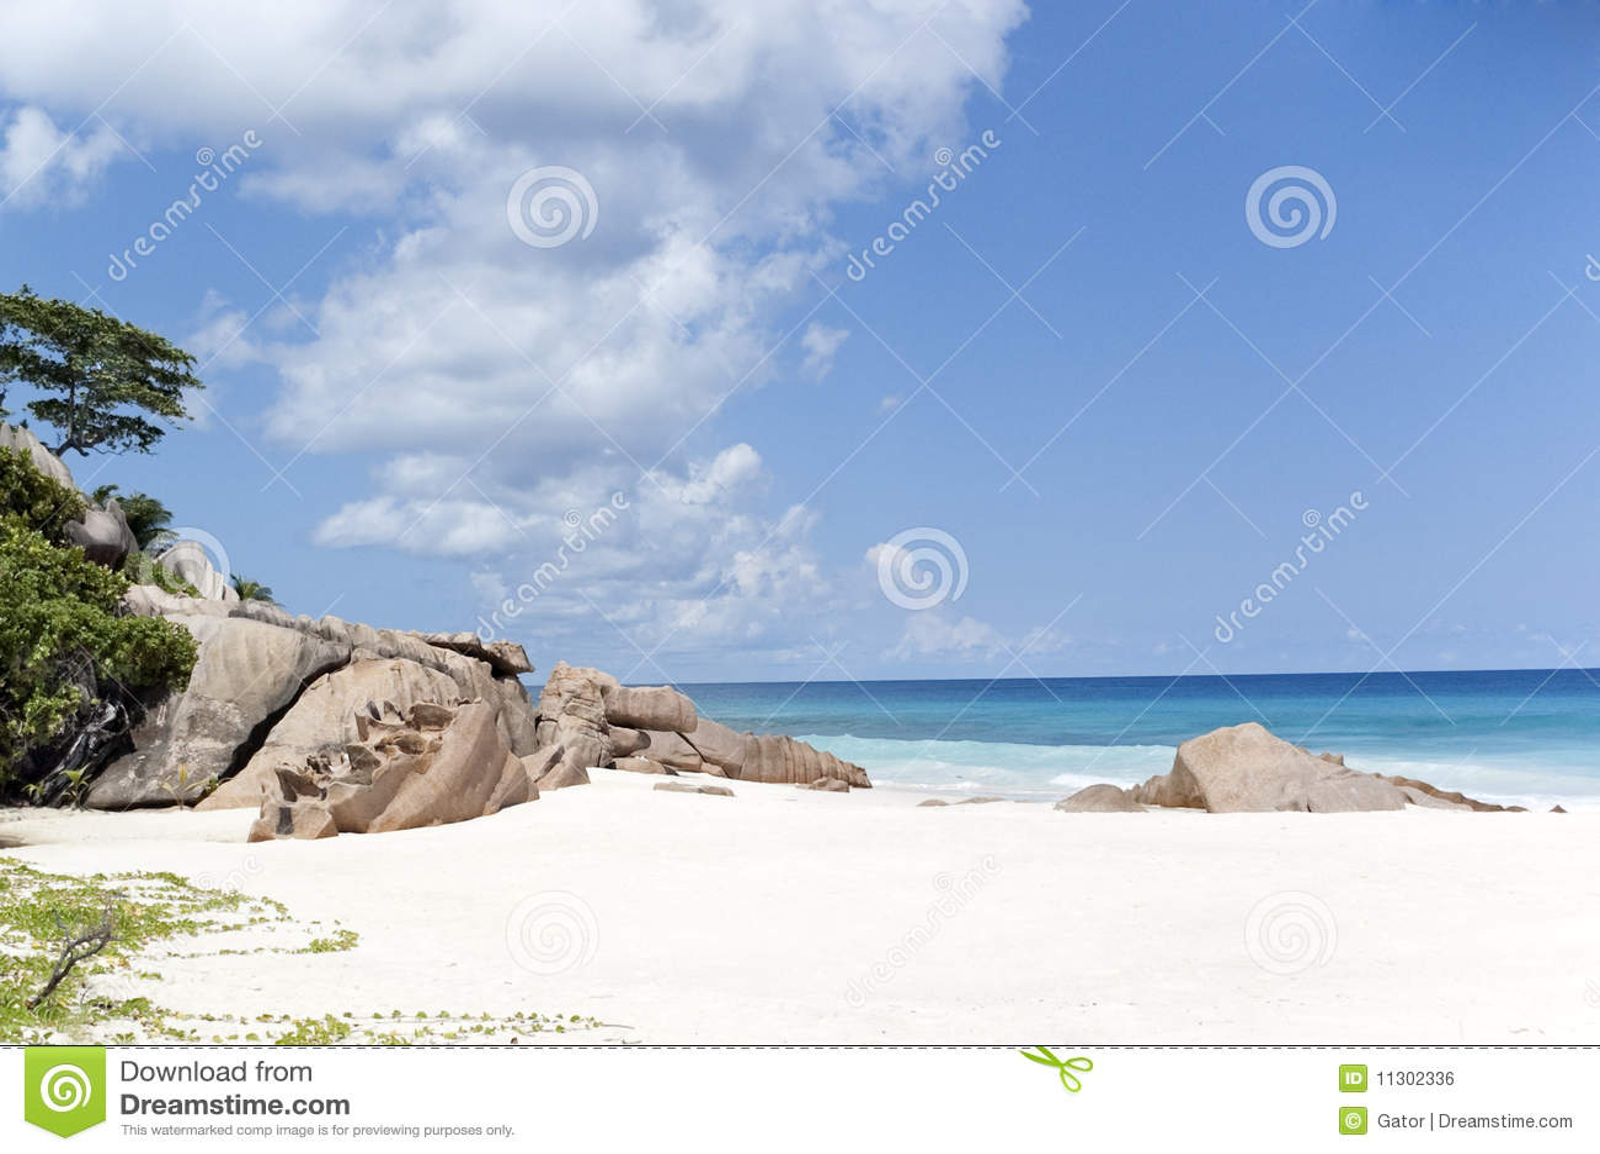 Schöner abgelegener tropischer Strand